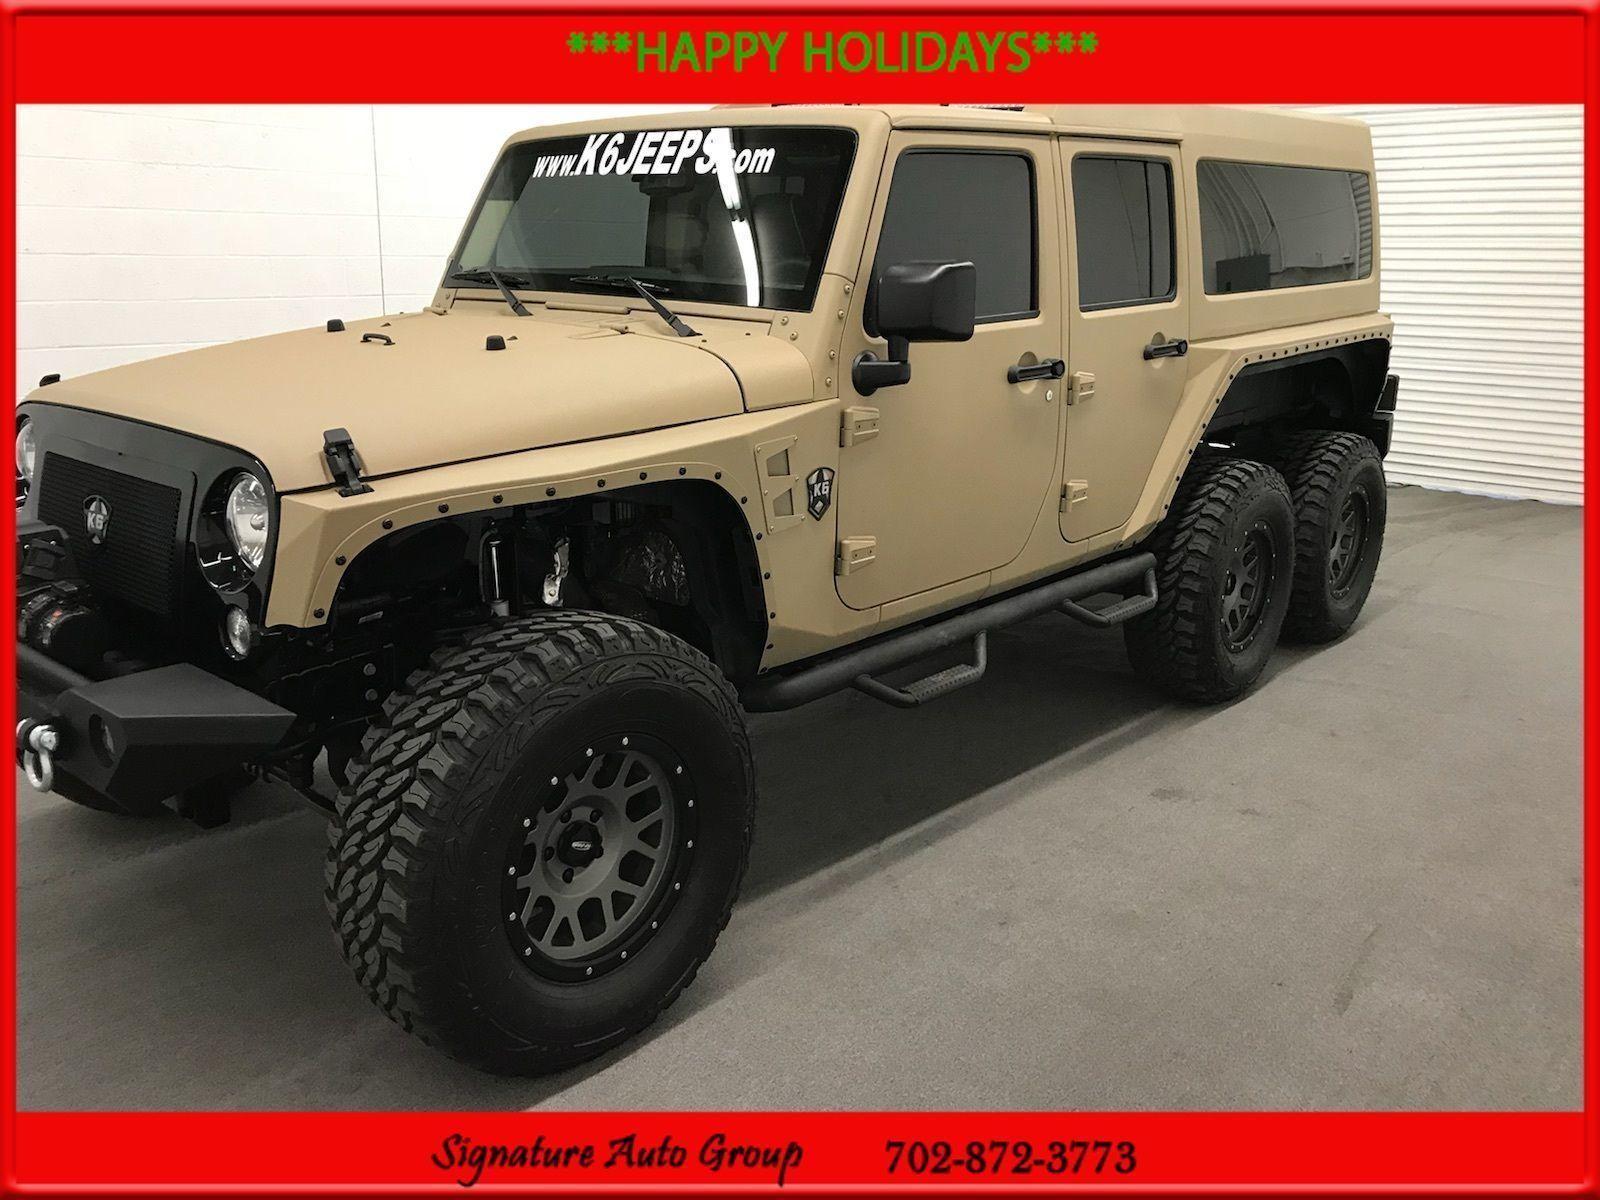 Used 2017 Jeep Wrangler 6 6 Jeep 6 Wheel Drive Used Rare Tvs Kev 2018 2019 Jeep Wrangler 2017 Jeep Wrangler Classic Trucks